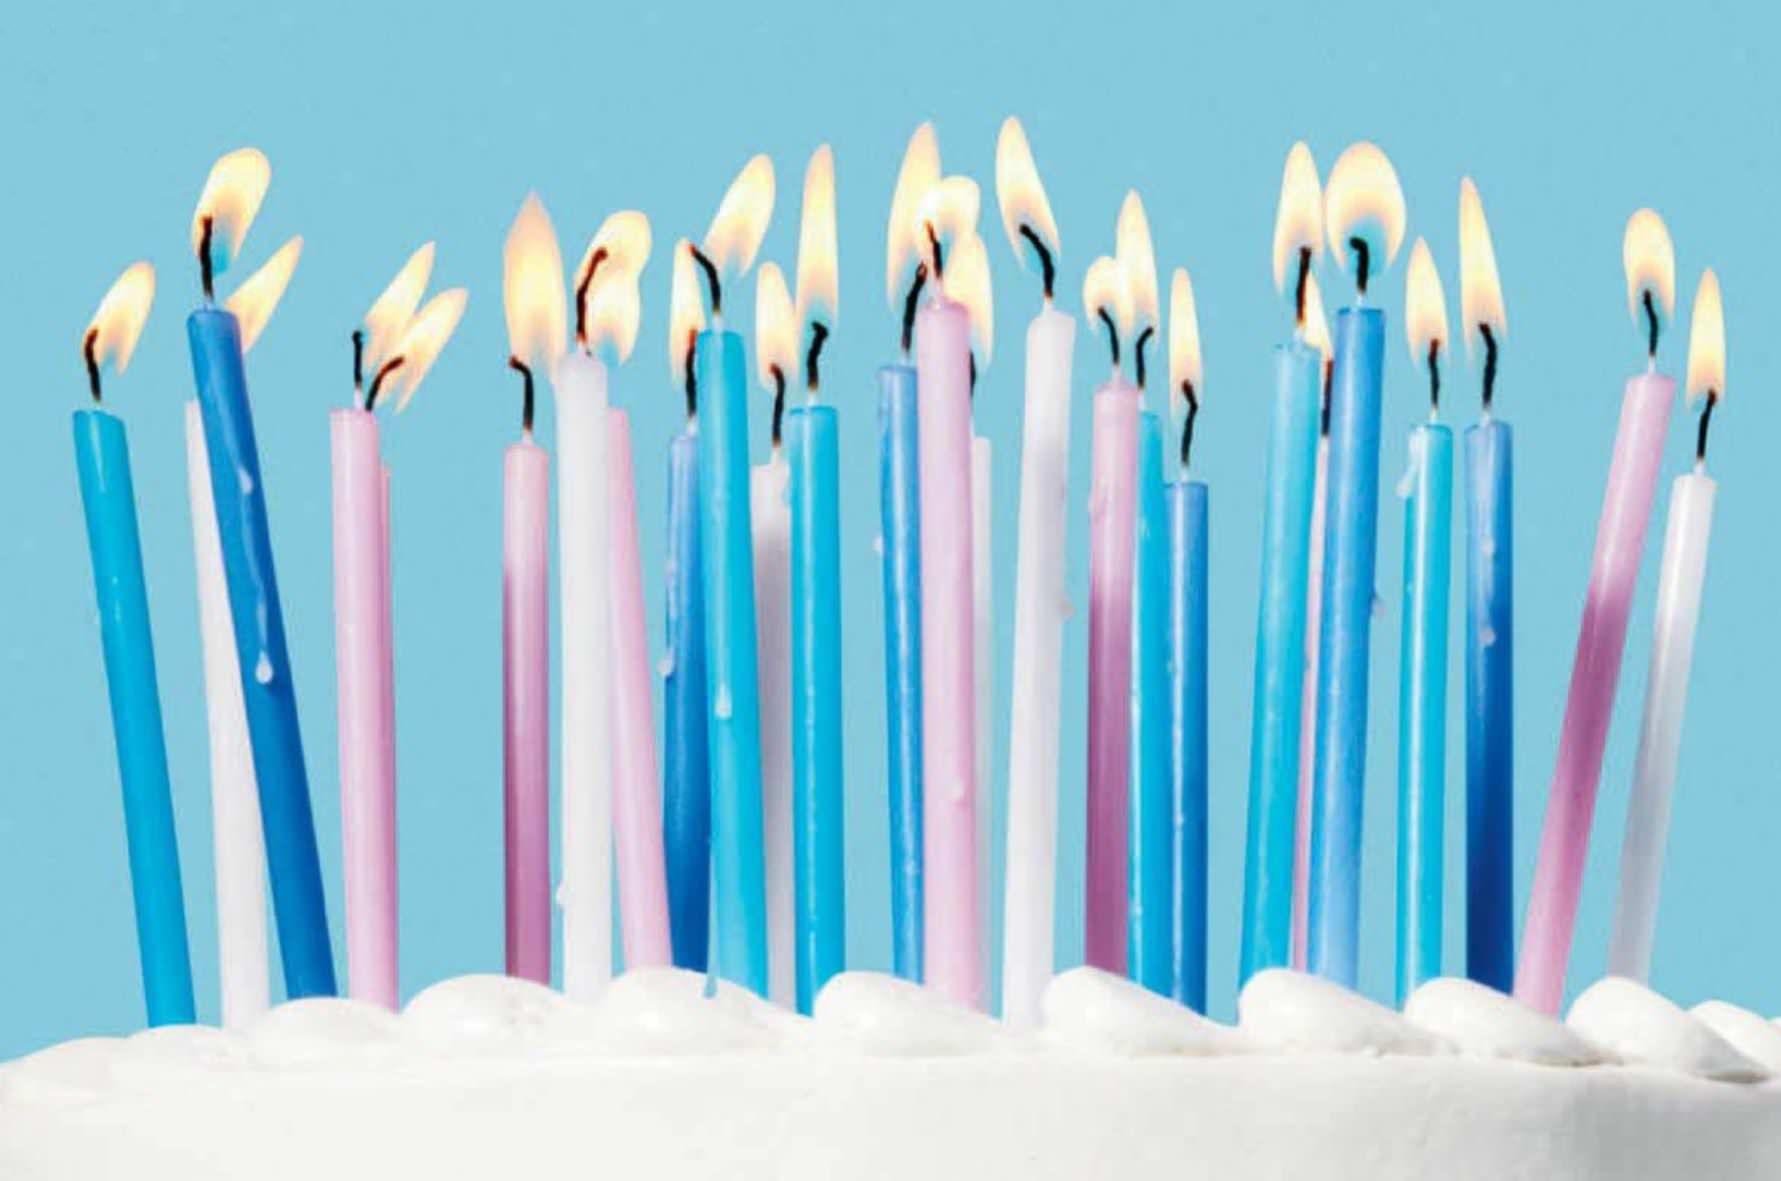 5 reasons to embrace your milestone birthday